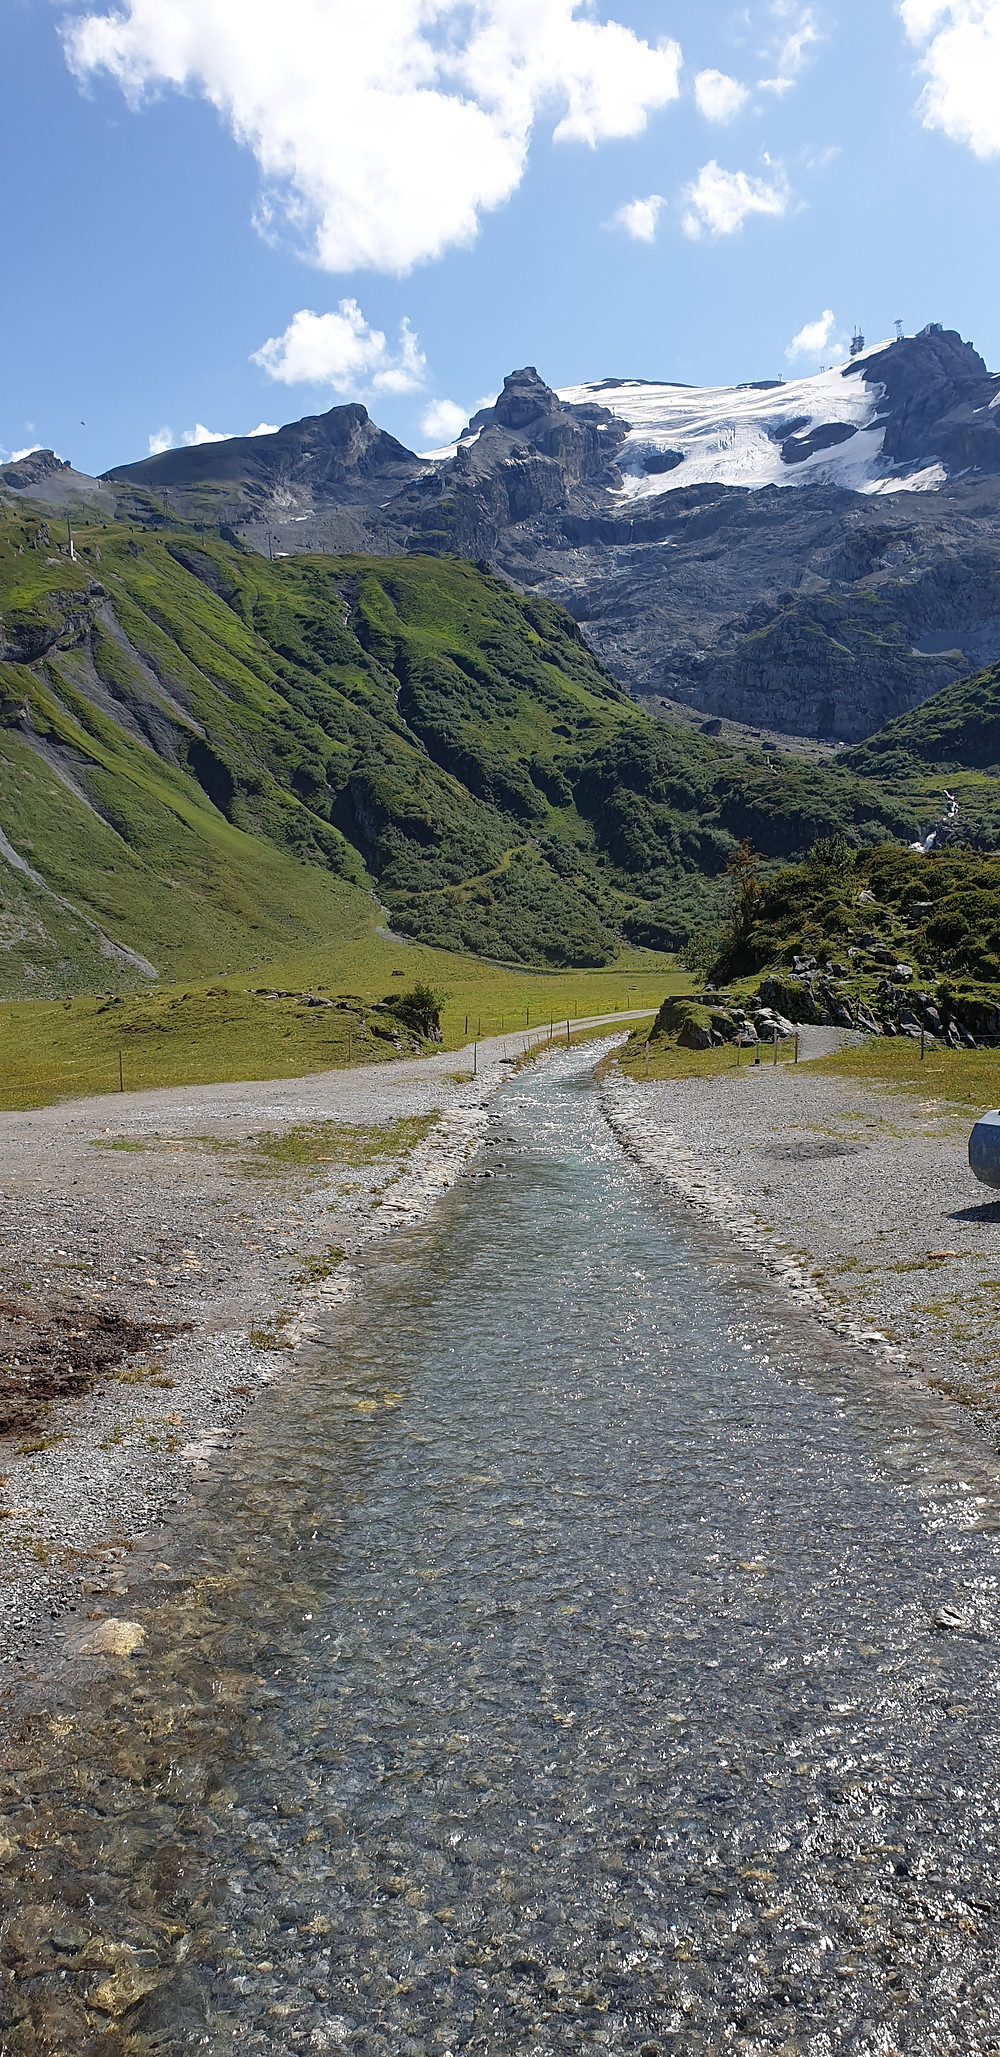 Mount Titlis in Engelberg